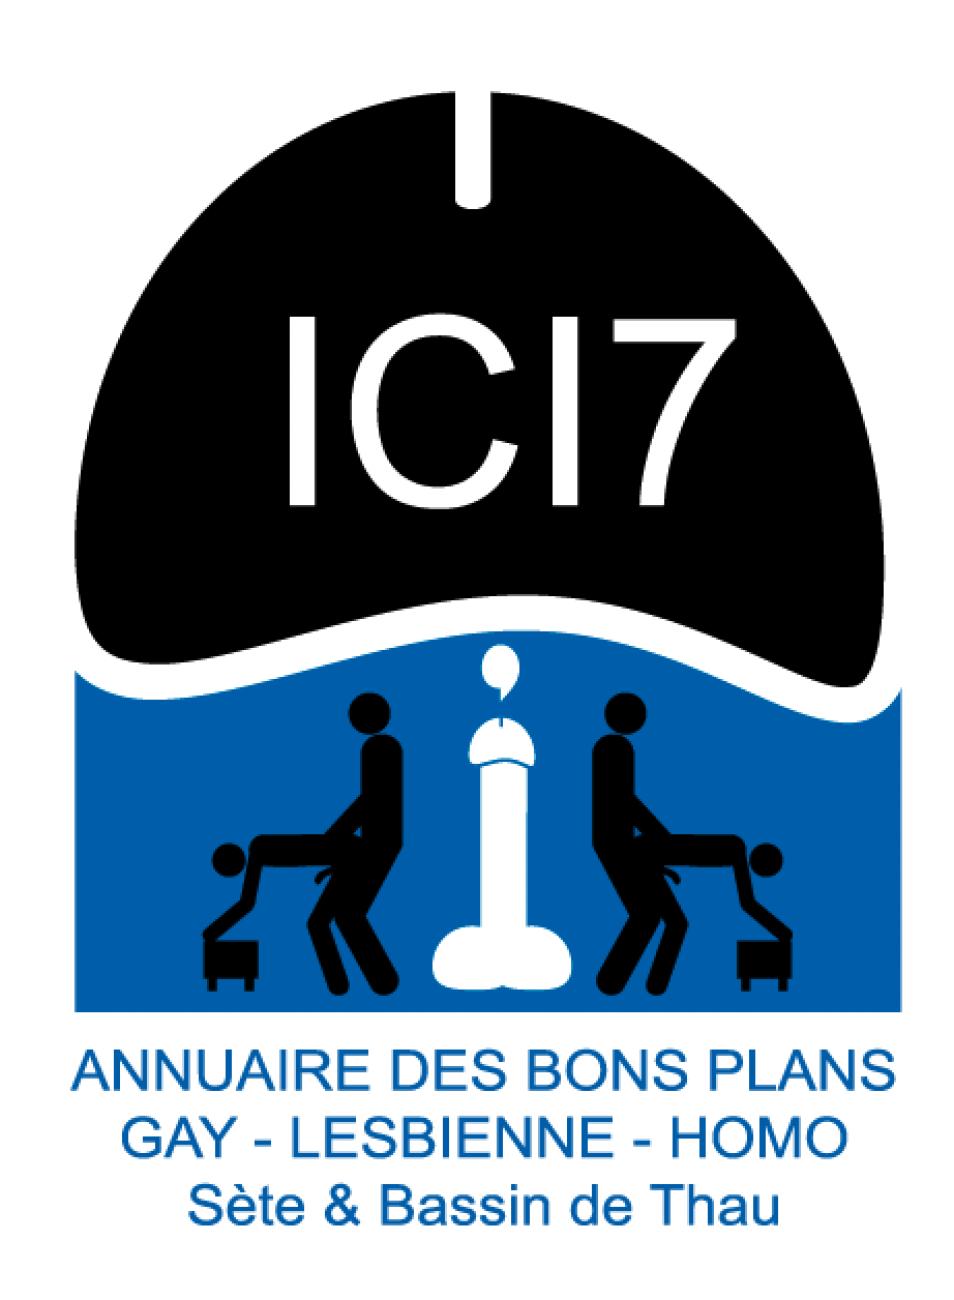 cropped-ICI-sete-7ici-annuaire-homo-Sete-bassin-de-thau.png